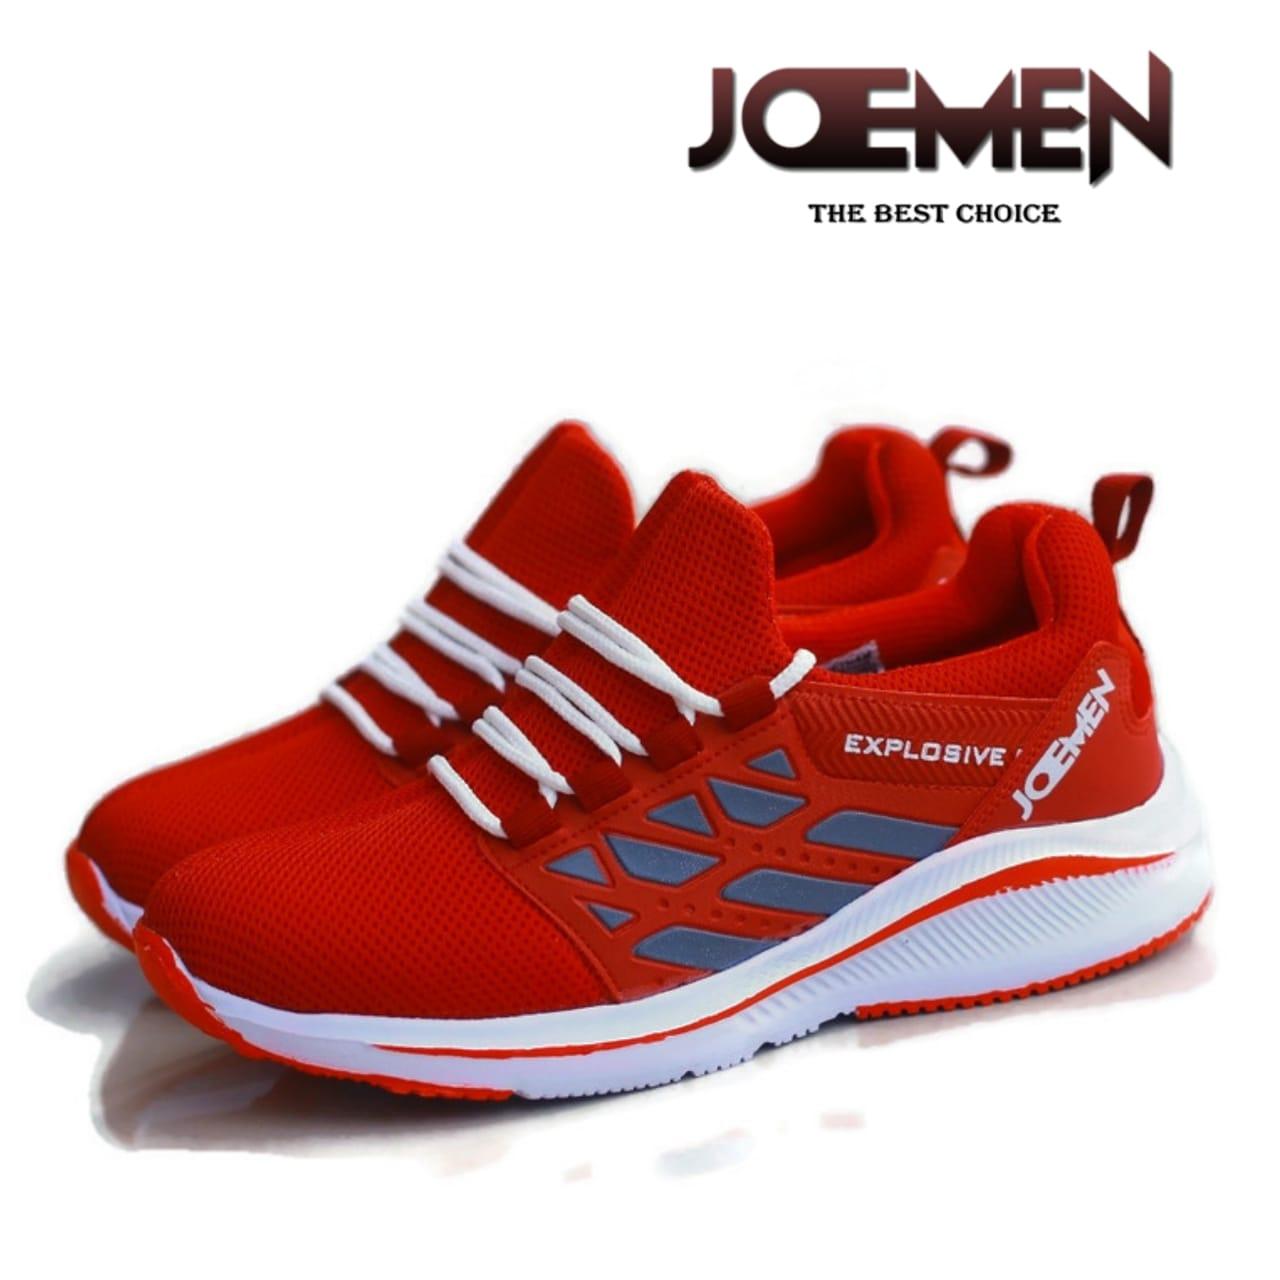 sepatu slip on joemen j 022 sepatu pria keren sepatu pria sport sepatu pria sepatu olahraga pria sepatu laki laki dewasa sepatu sport pria sepatu cowok model  2020 sepatu kulit pria sepatu wanita sepatu sekolah anak laki laki